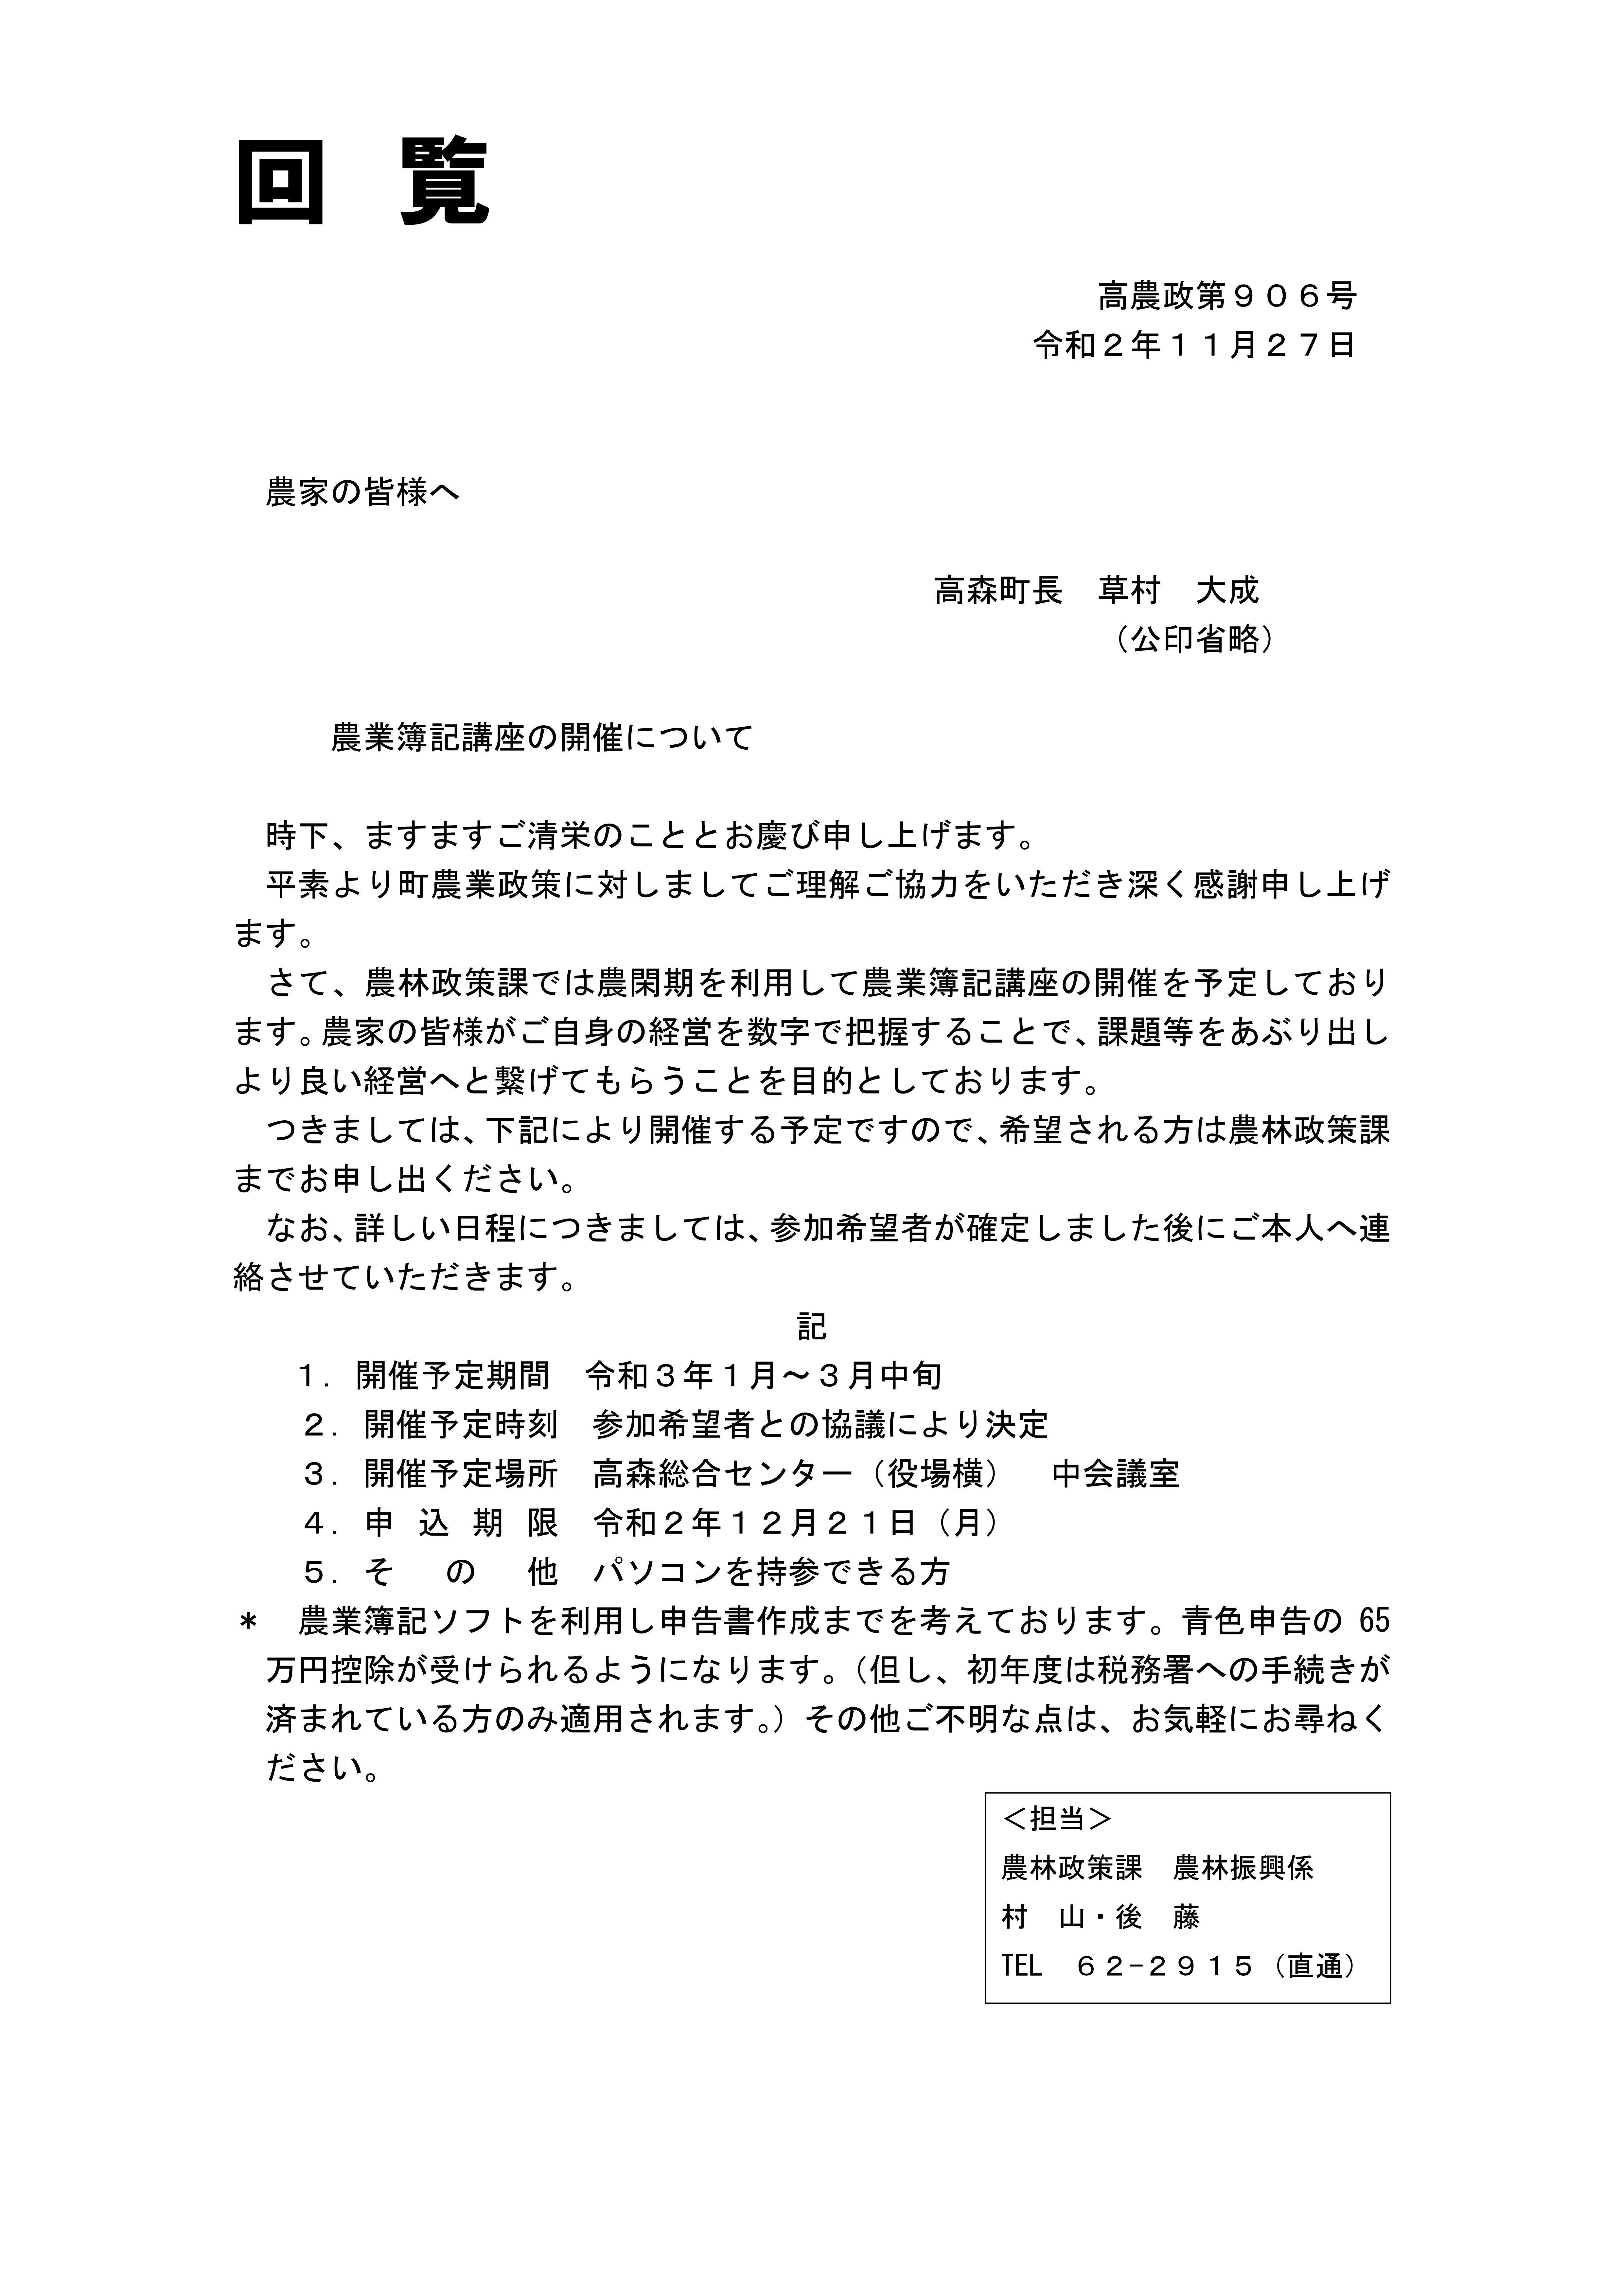 http://www.town.takamori.kumamoto.jp/chosha/somu/upload/150e4394abd4097af10c9a2df0a48928b09398f8.jpg